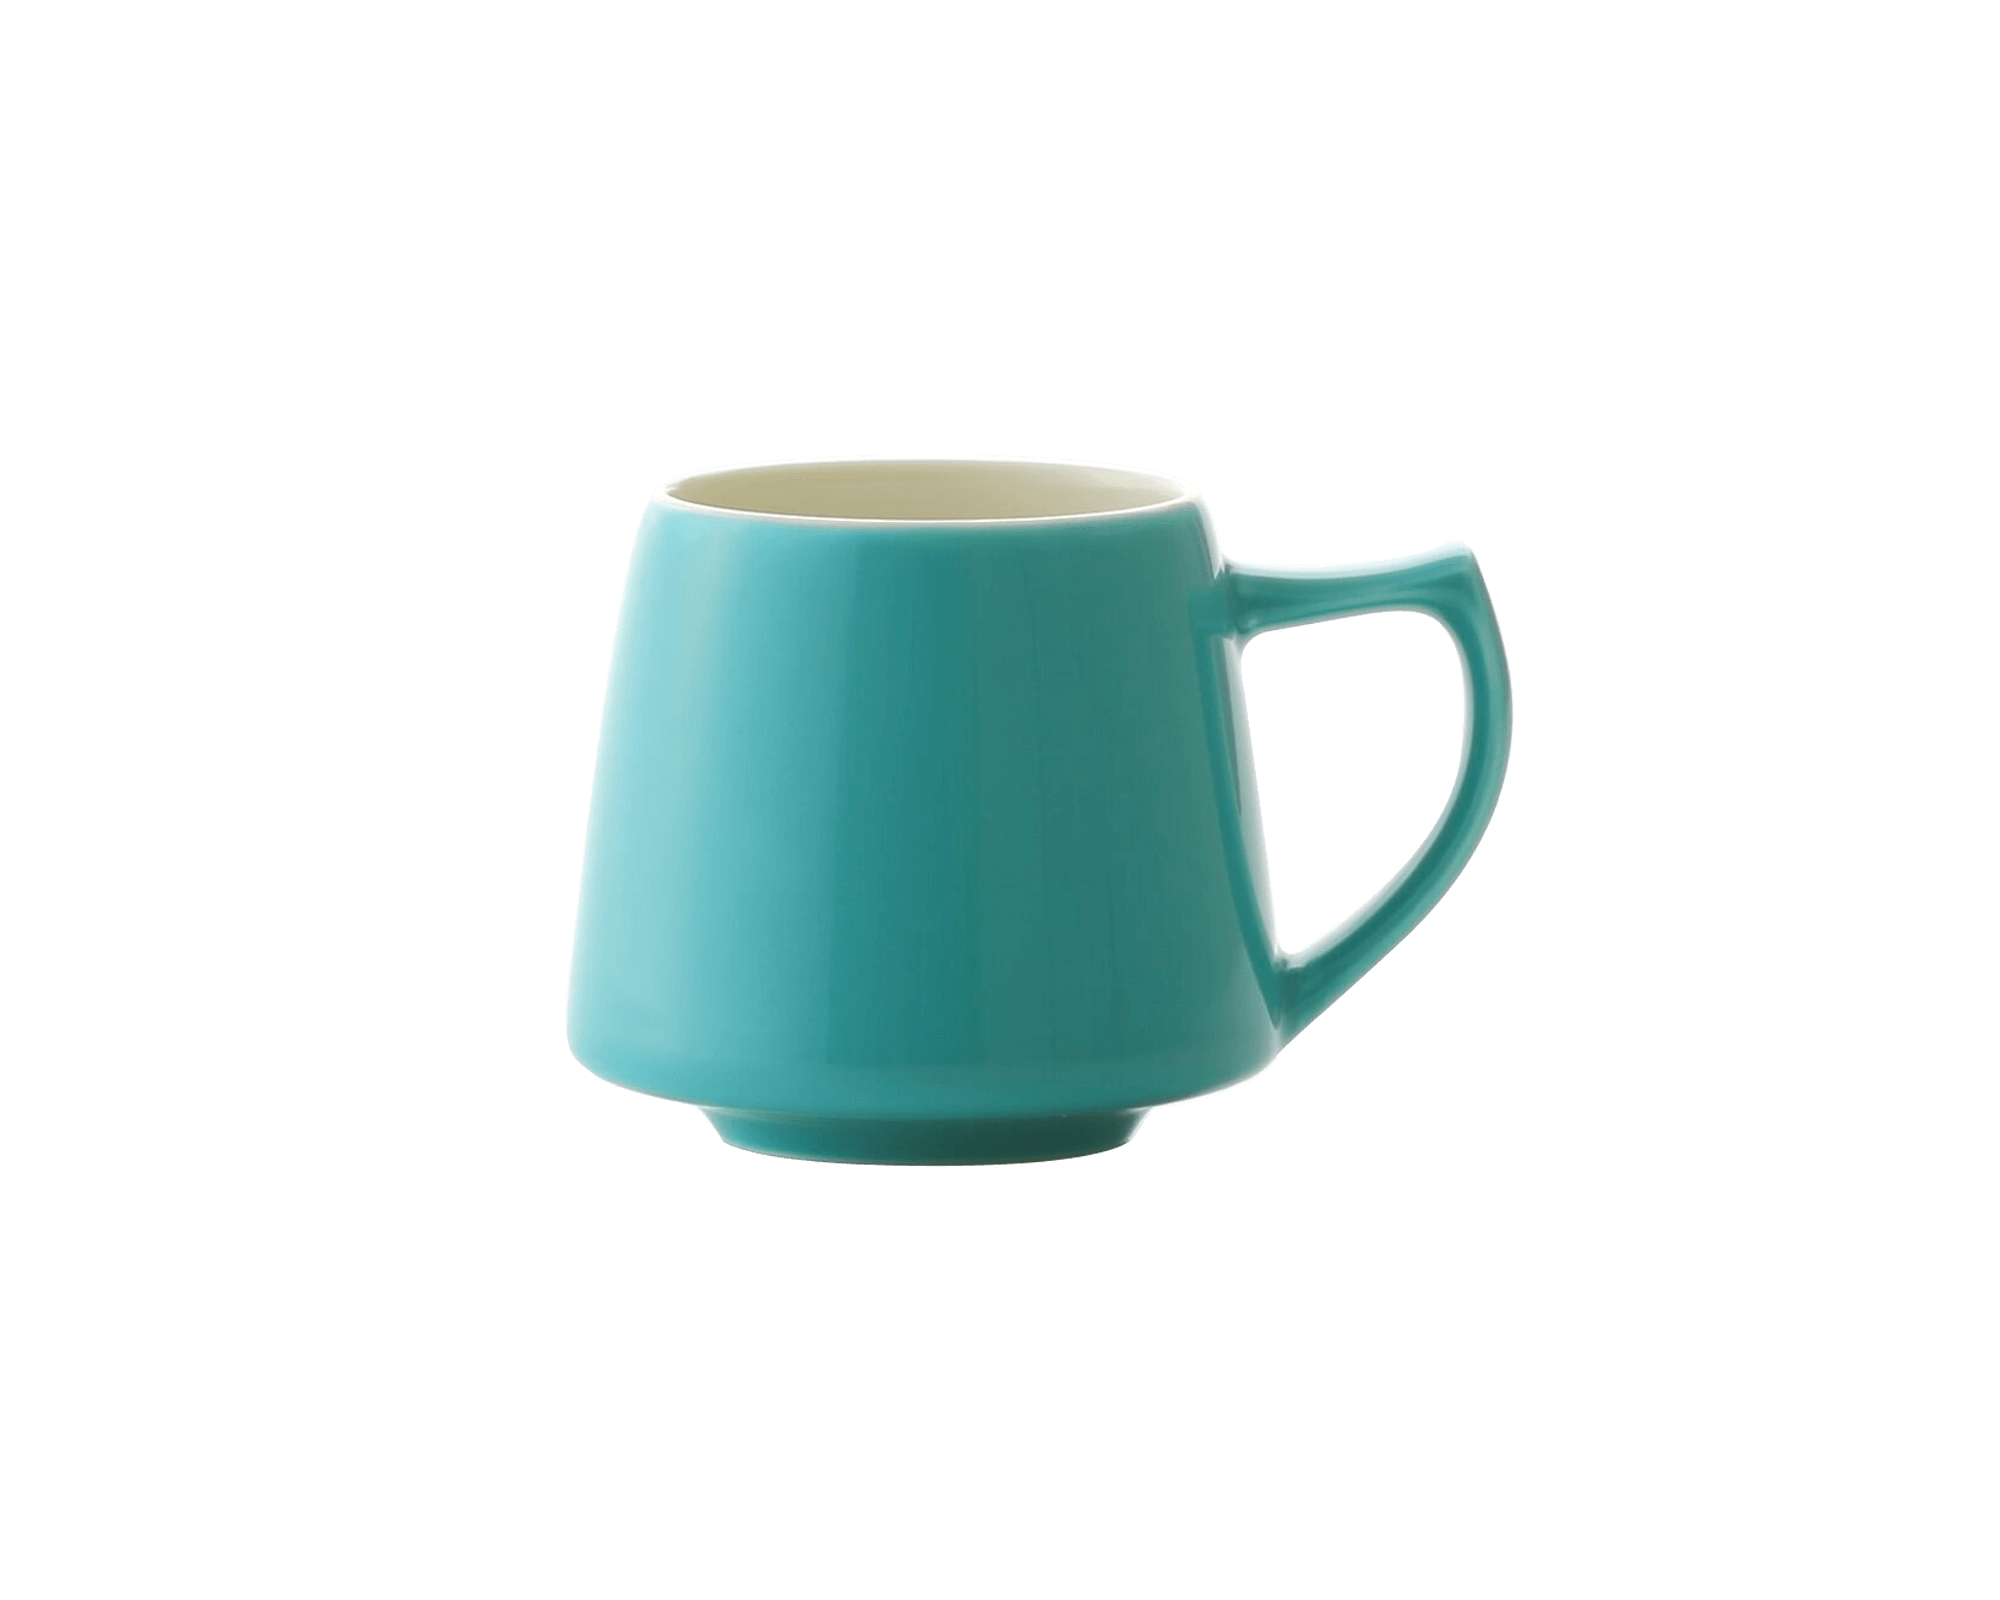 Tasse Aroma turquoise en porcelaine du Japon Origami I Café Michel